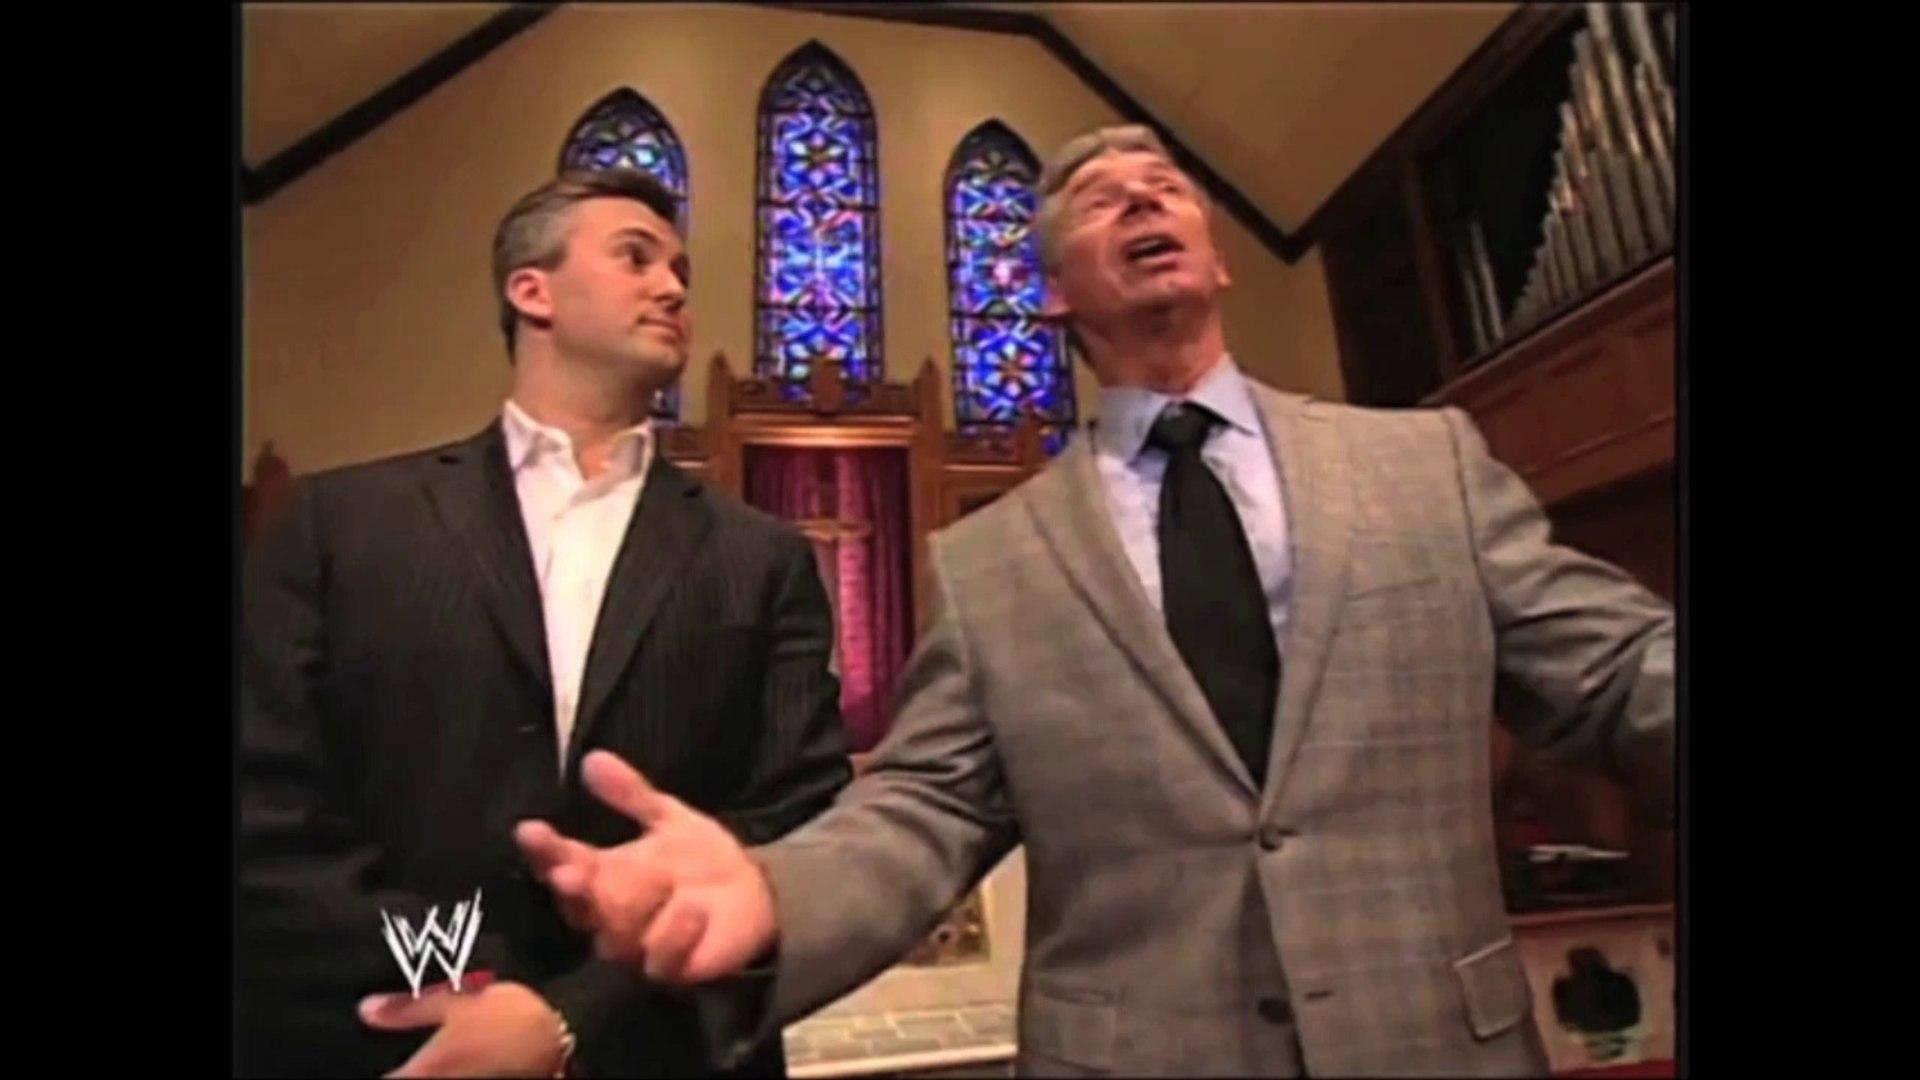 Worst Religious Gimmicks | Wrestling With Wregret